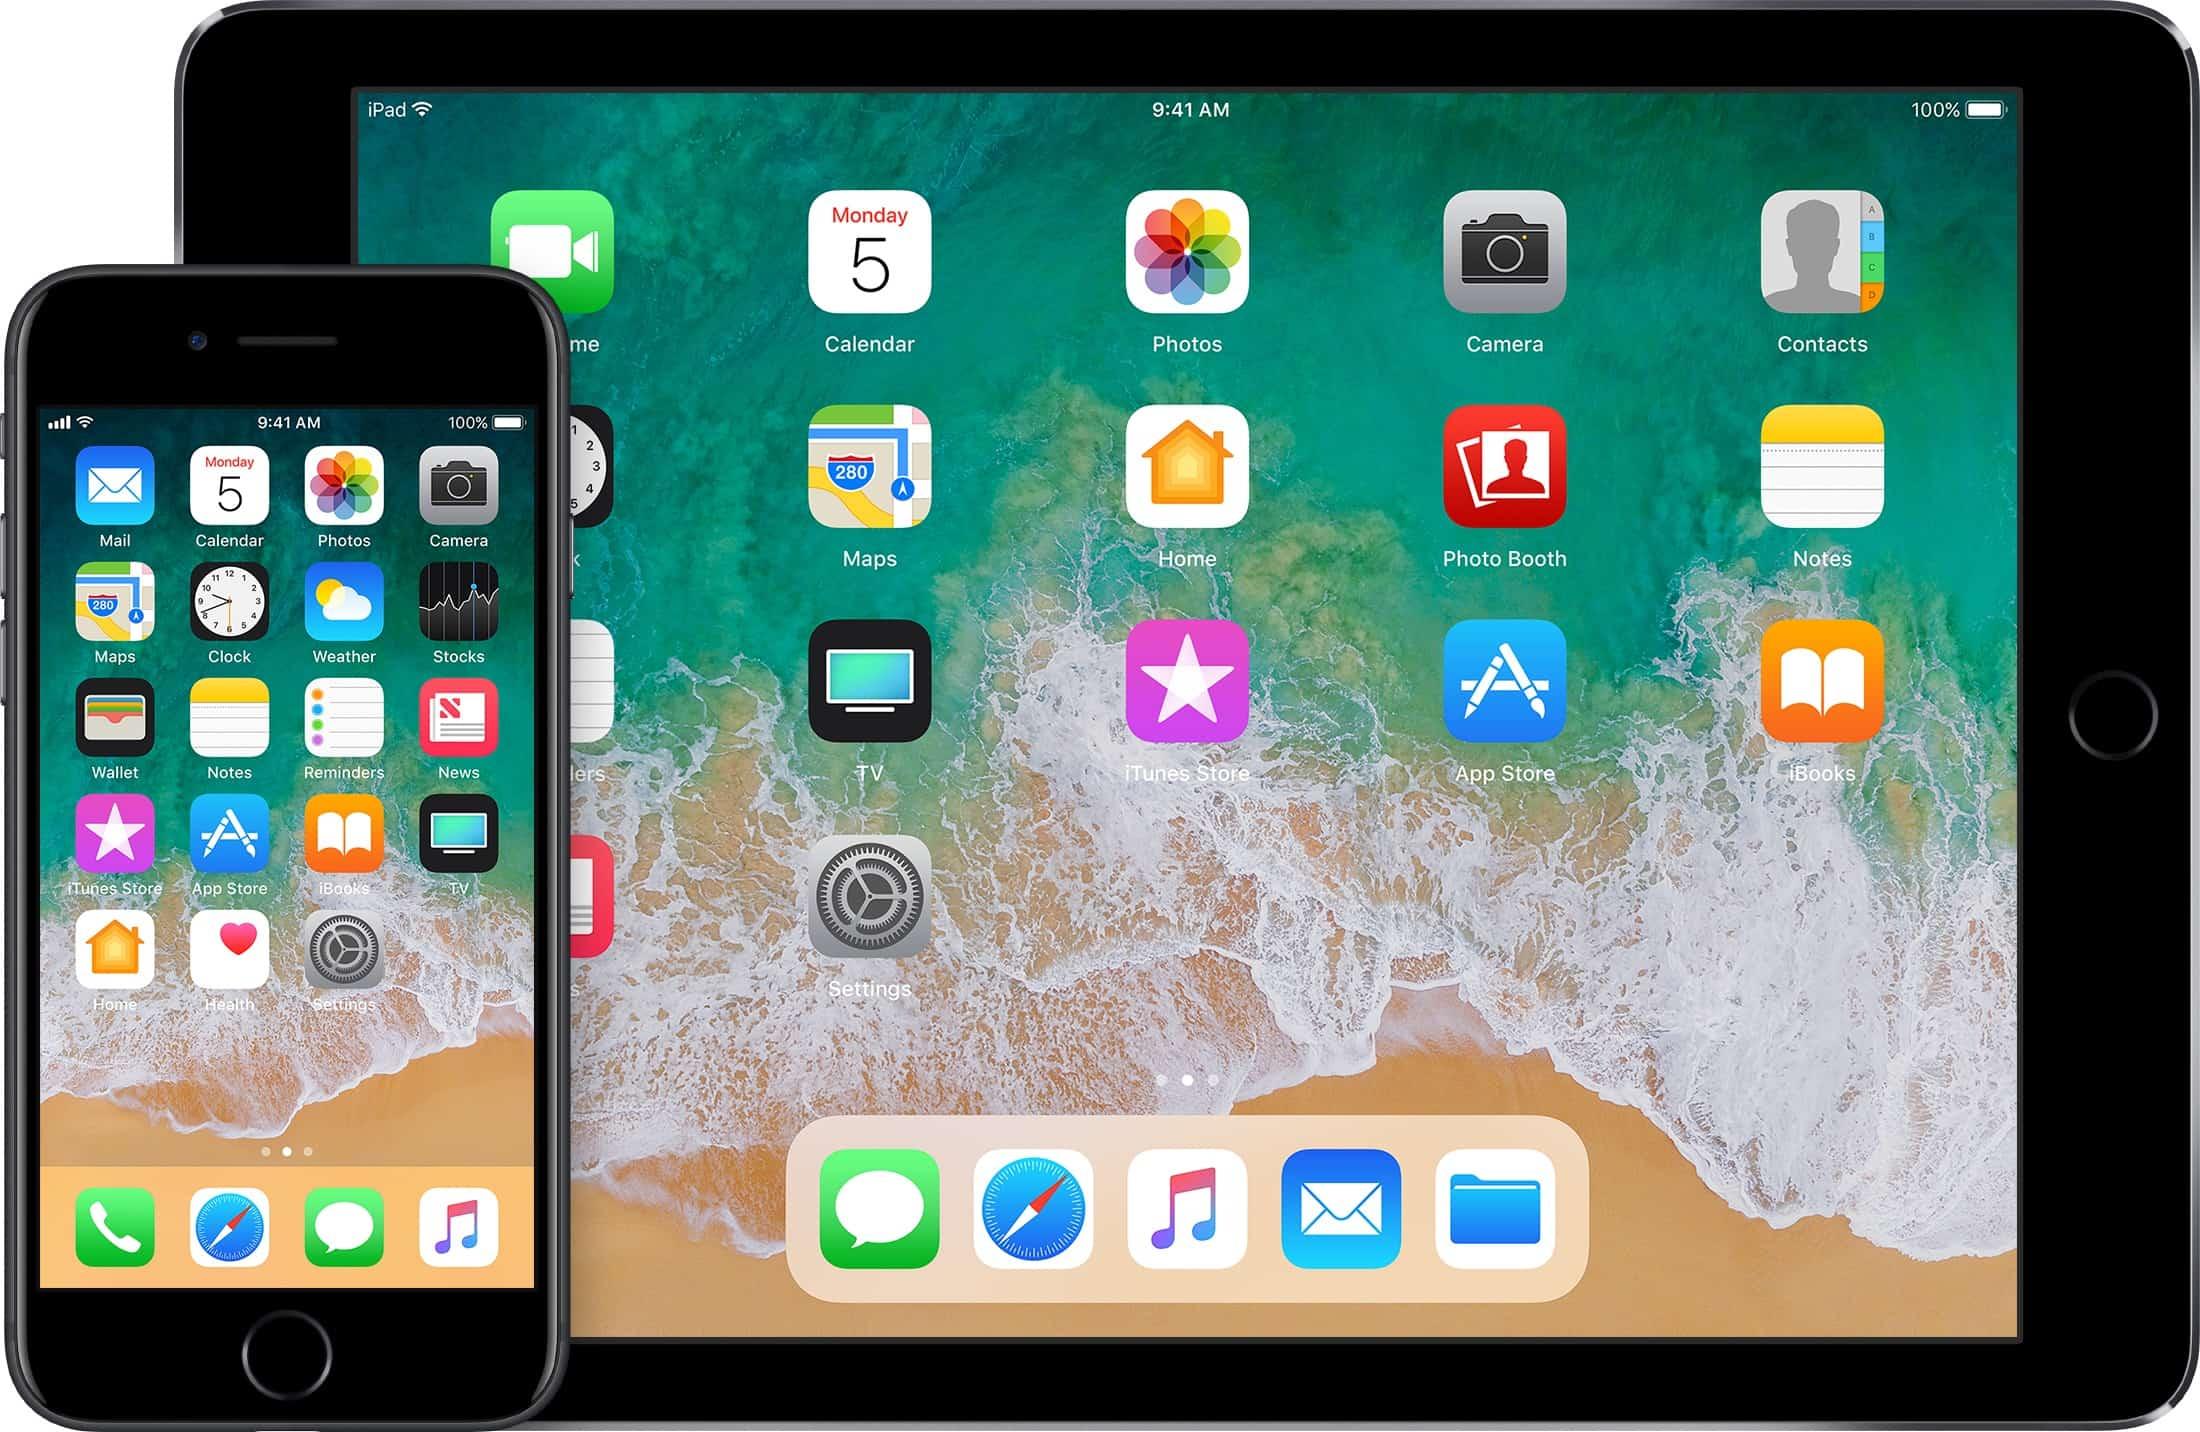 ios 11 home screen iPhone ipad - Okienko do minulosti: História iOS